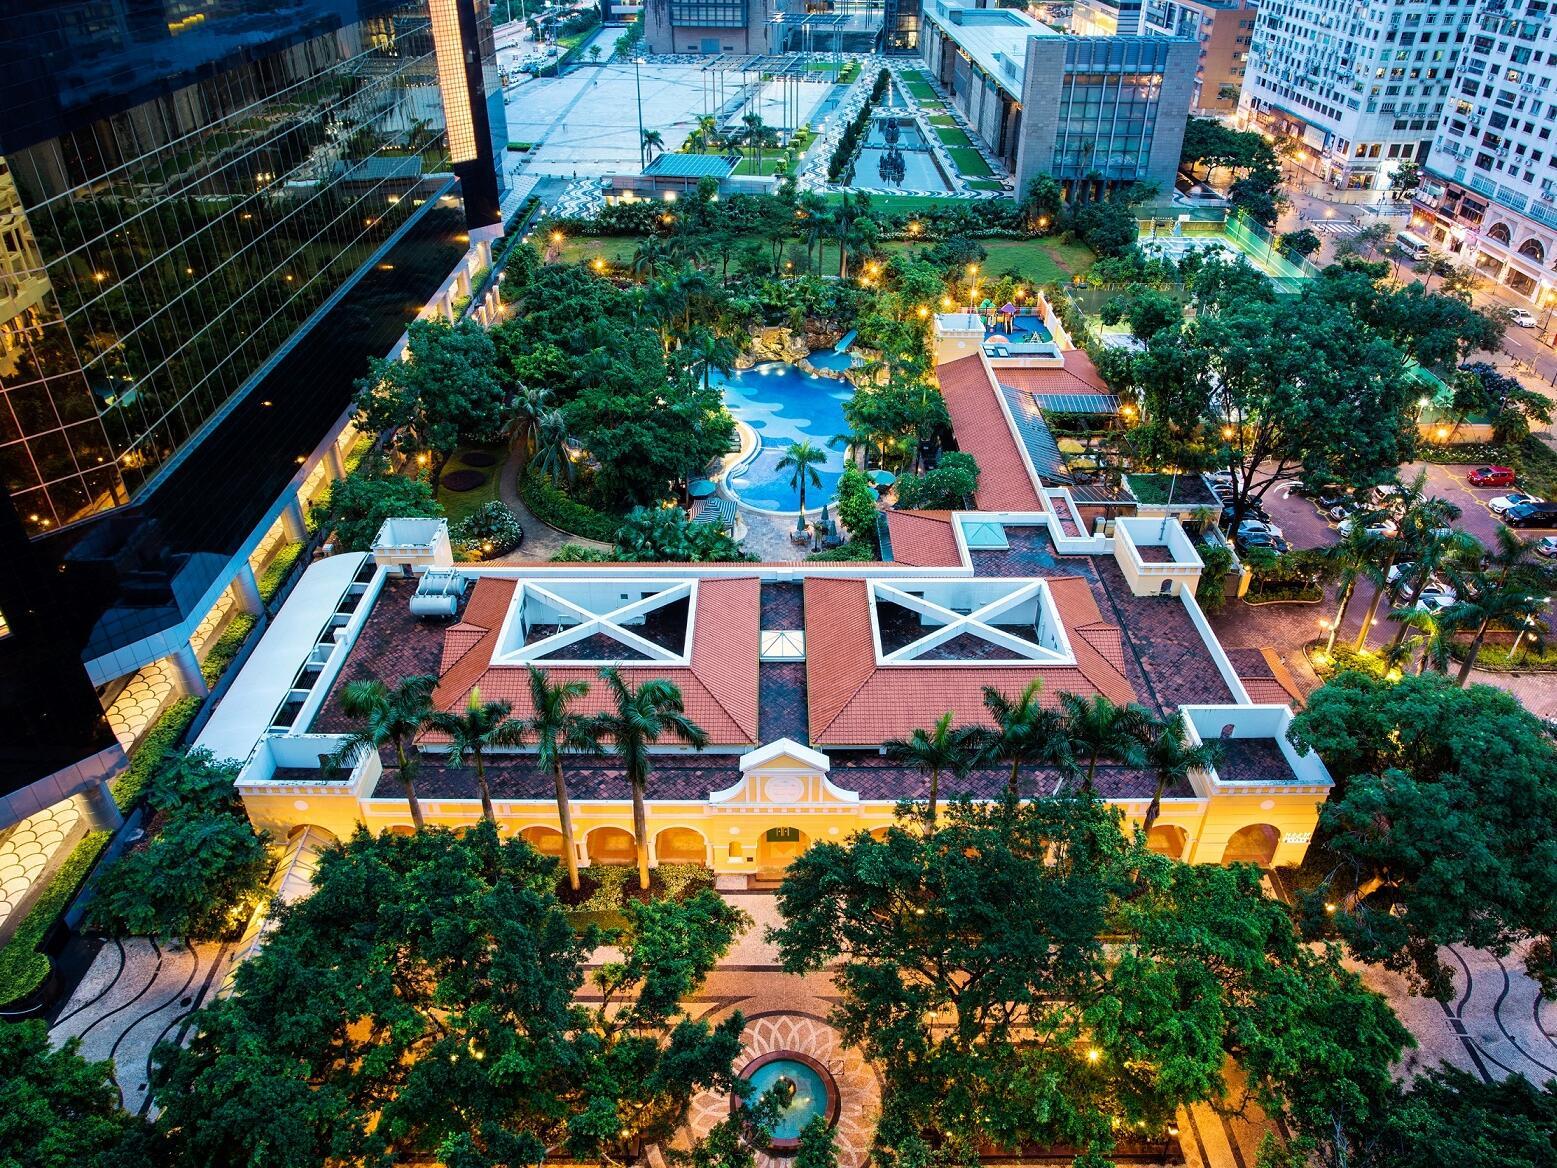 Sky view of Artyzen Grand Lapa Hotel Macau